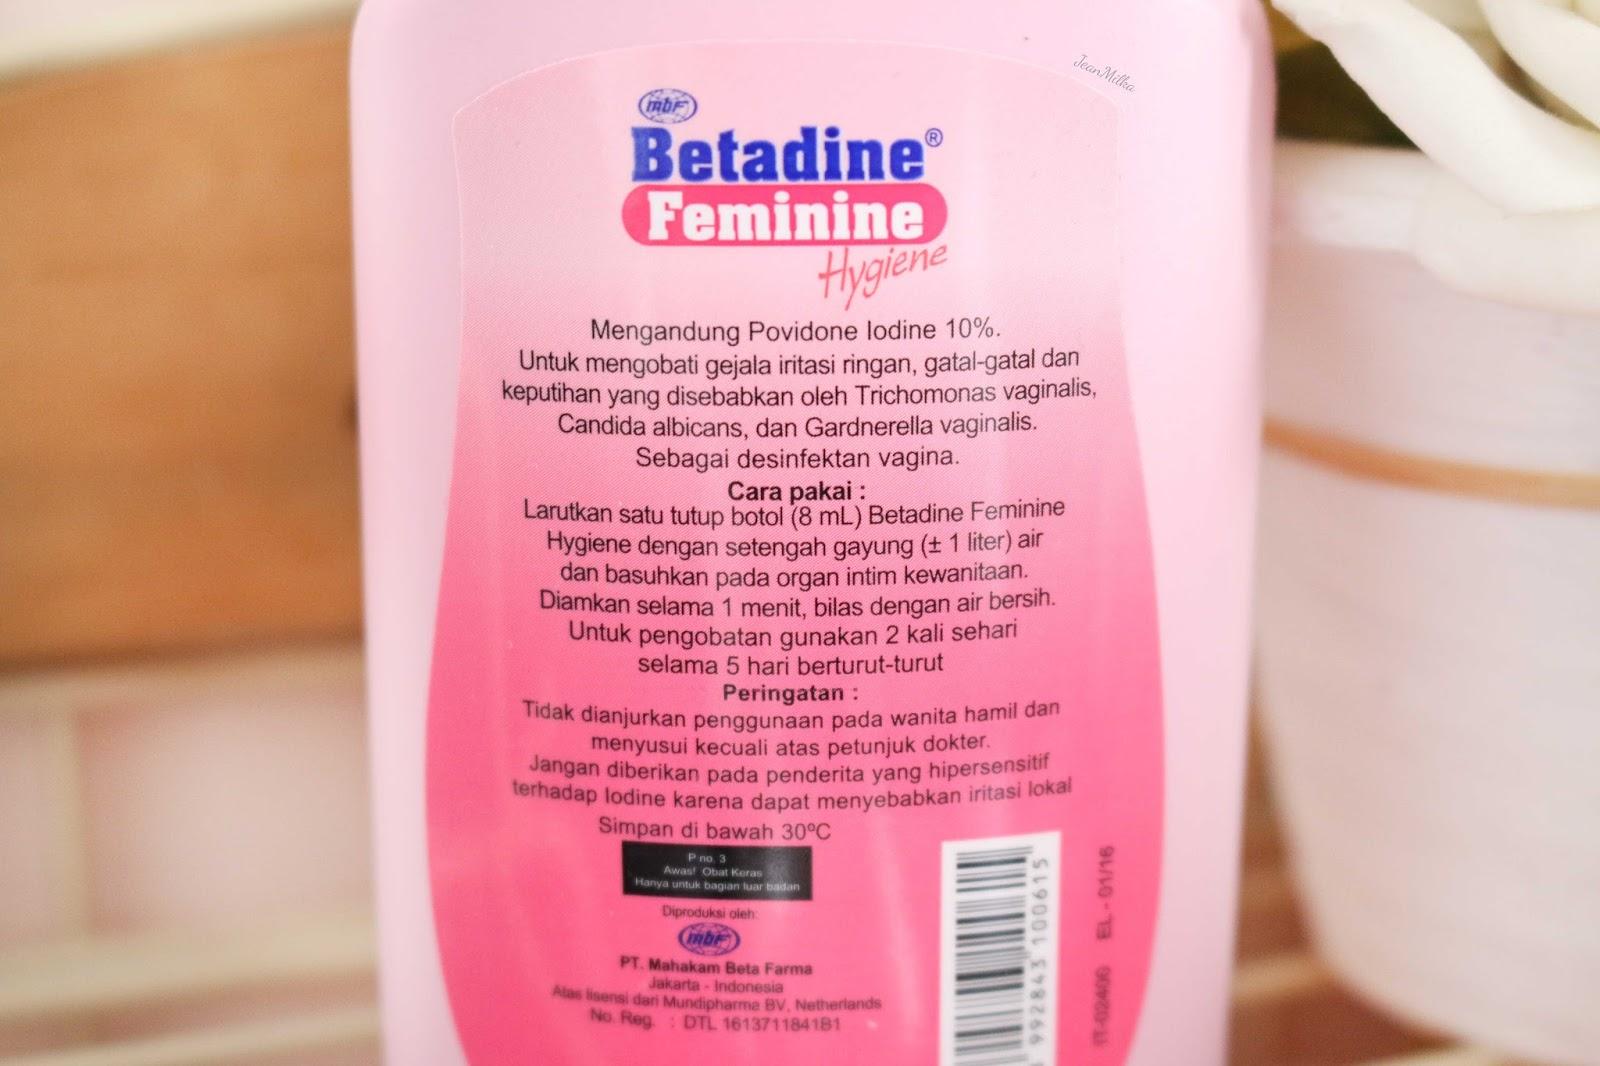 betadine, lifestyle, betadine feminine hygiene, daerah kewanitaan, vagina, menstruasi, merawat daerah kewanitaan